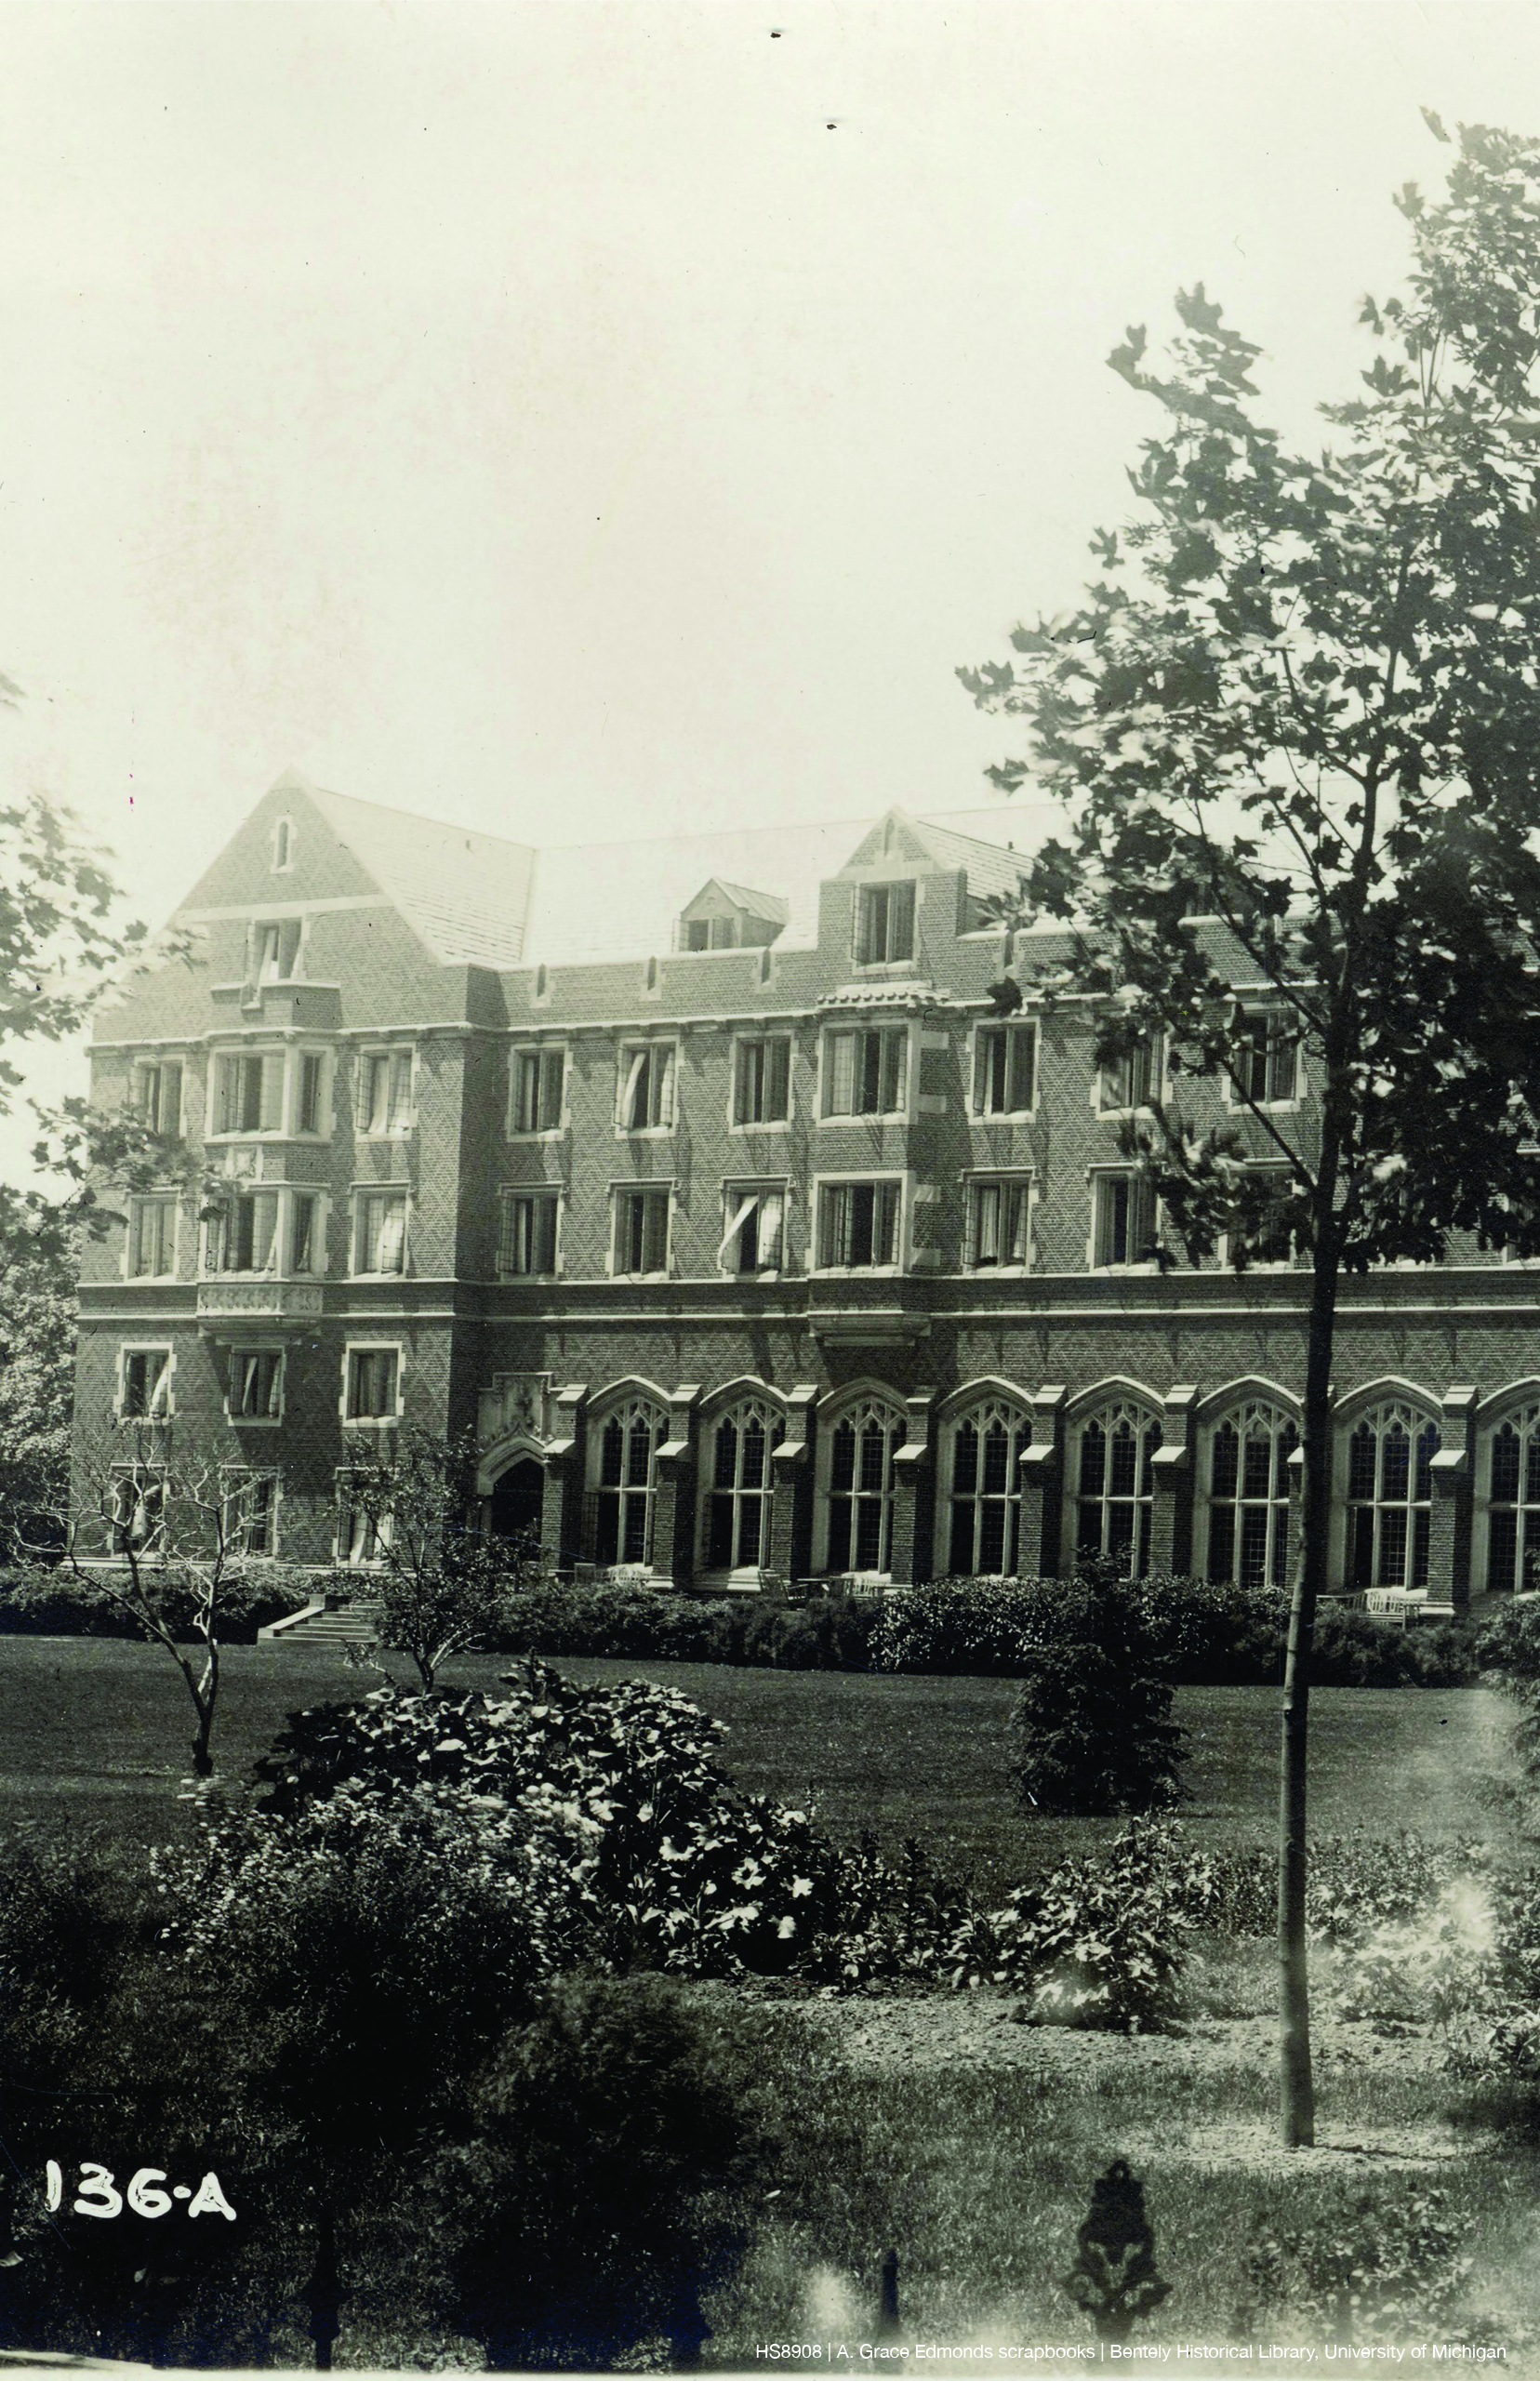 Photo of the Martha Cook Residence Hall